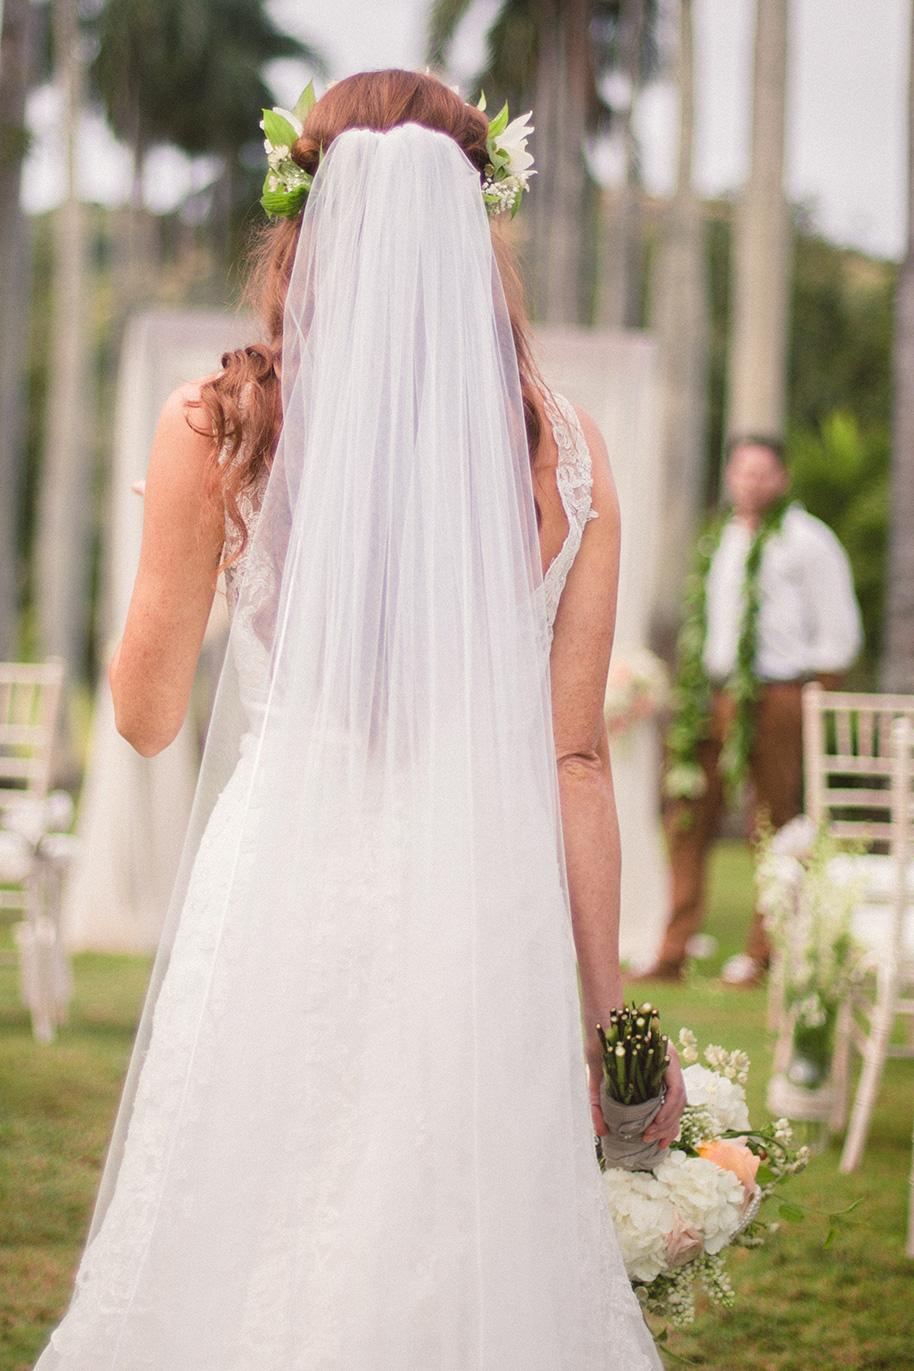 Dillingham-Ranch-Wedding-040516-9